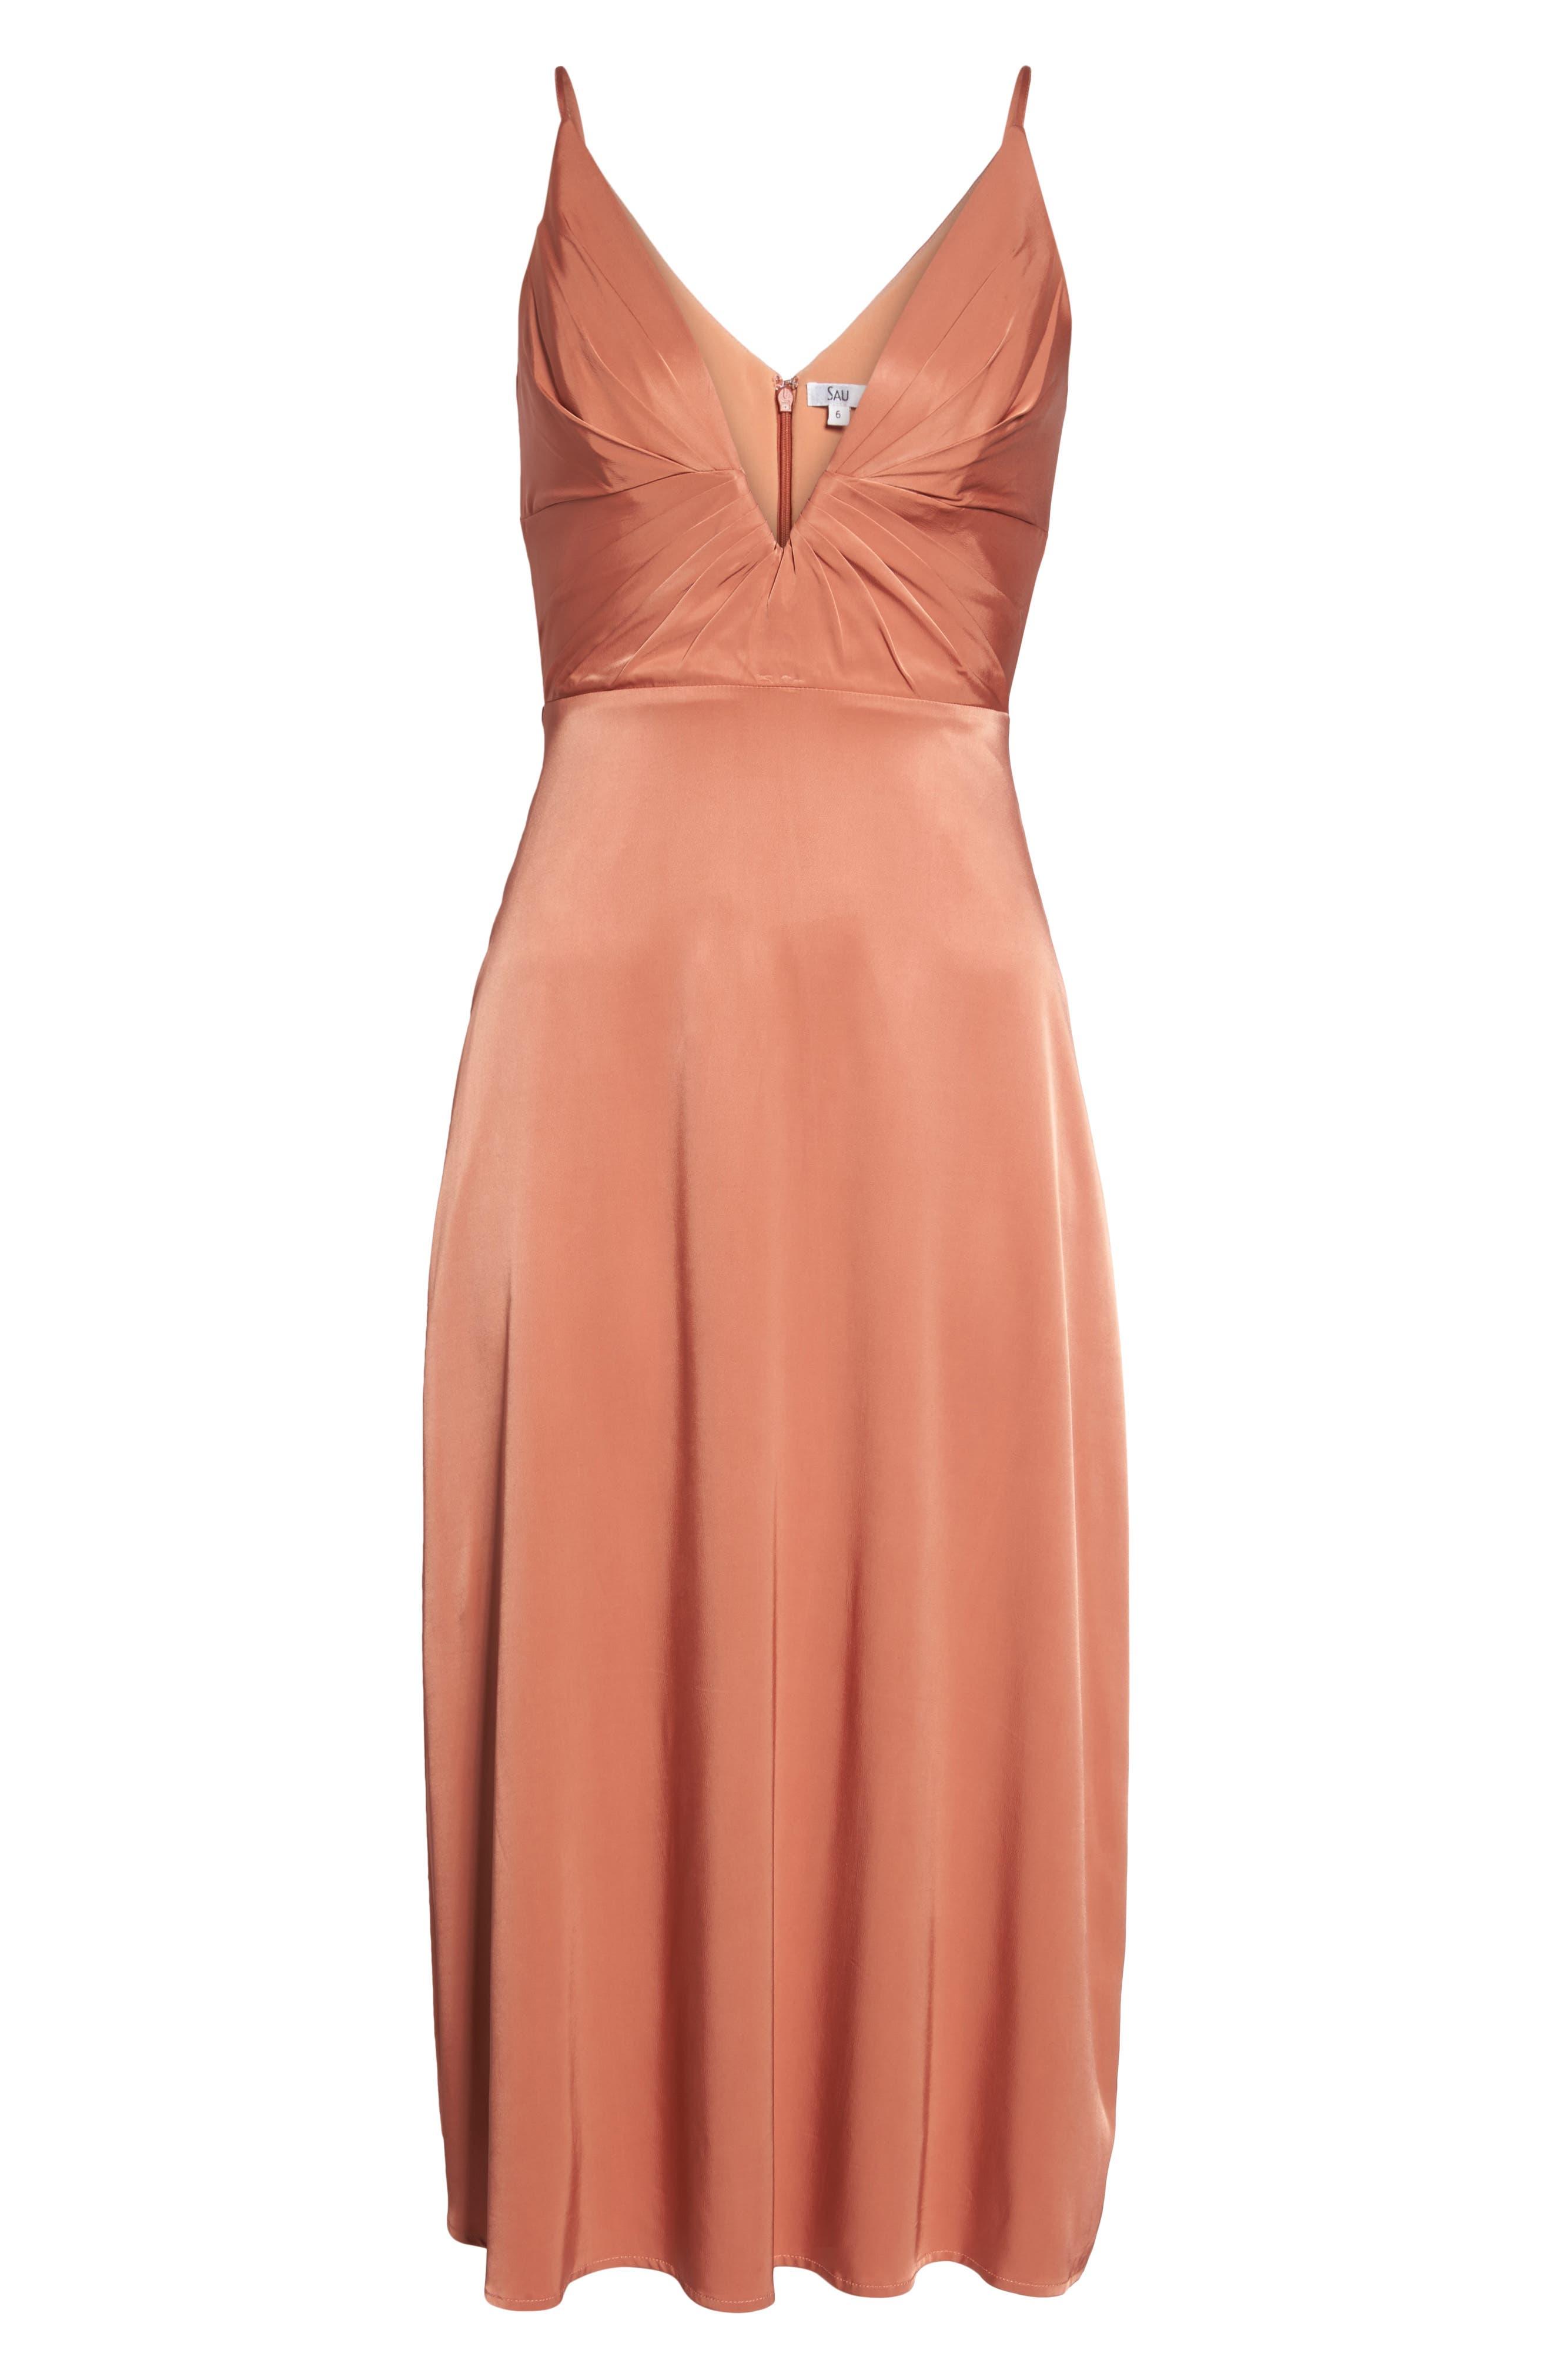 Lea Plunge Neck Midi Dress,                             Alternate thumbnail 6, color,                             Terracotta